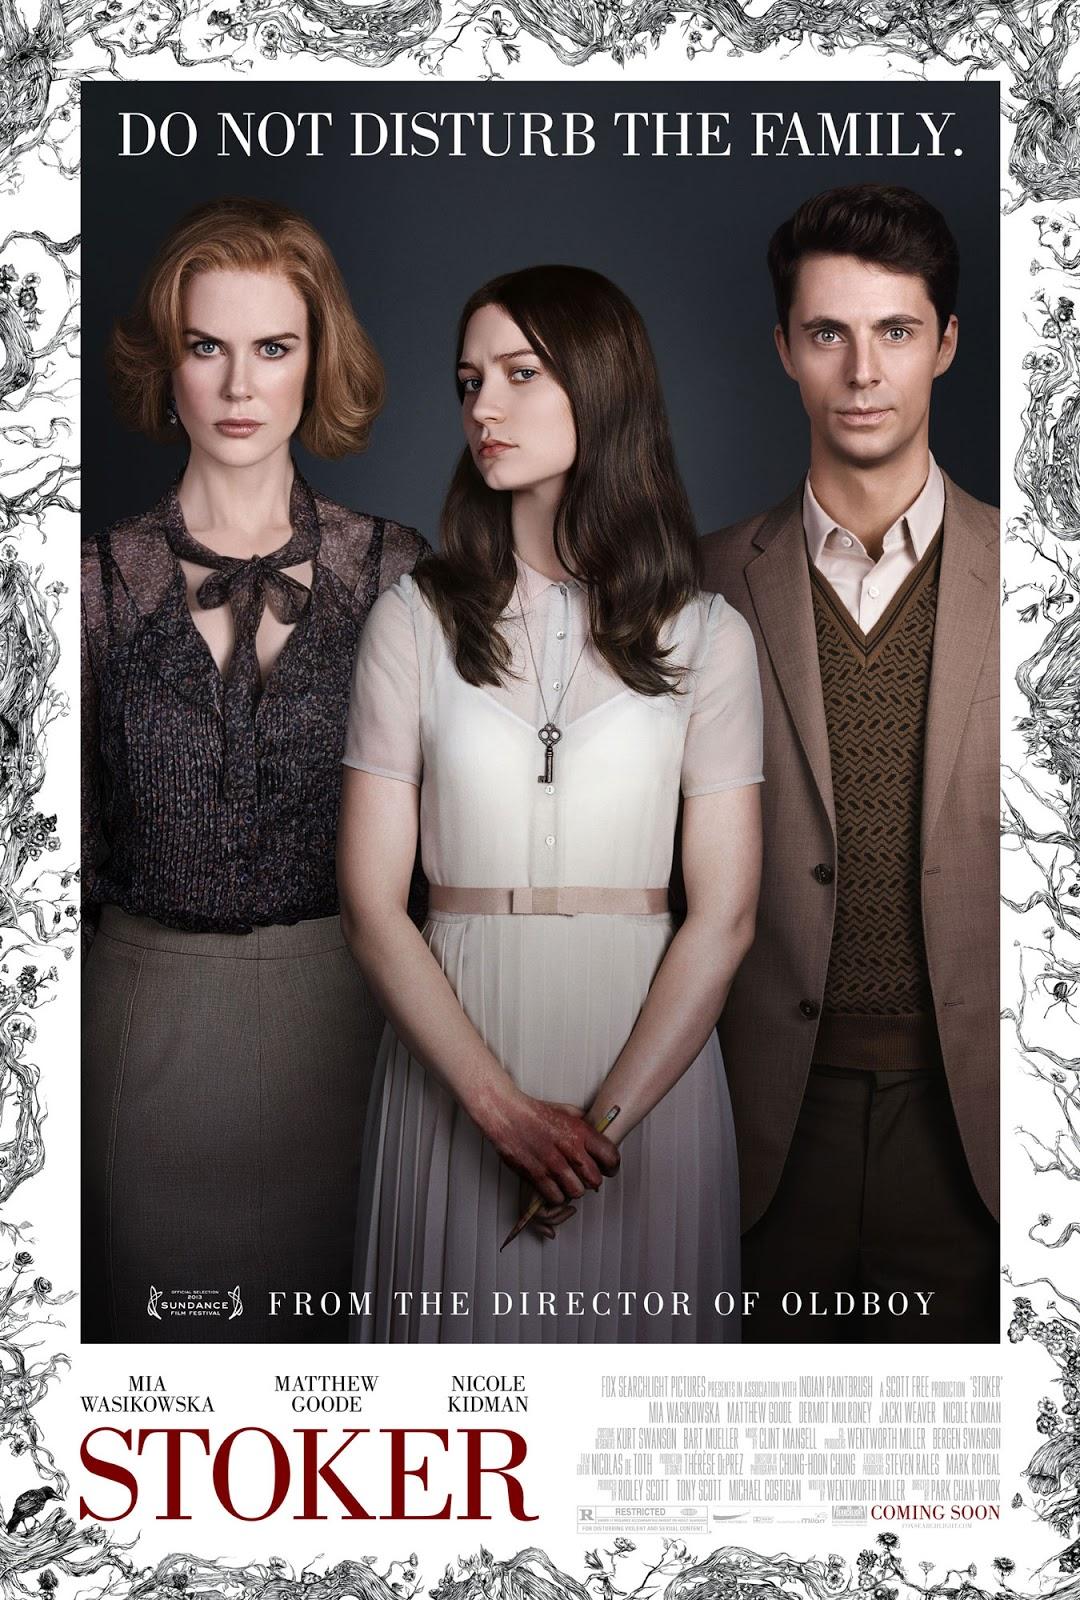 http://2.bp.blogspot.com/--OlxeI7EAcg/US5mb0-y2dI/AAAAAAAAPhE/ei0MpOWXtAg/s1600/stoker-poster-us.jpeg